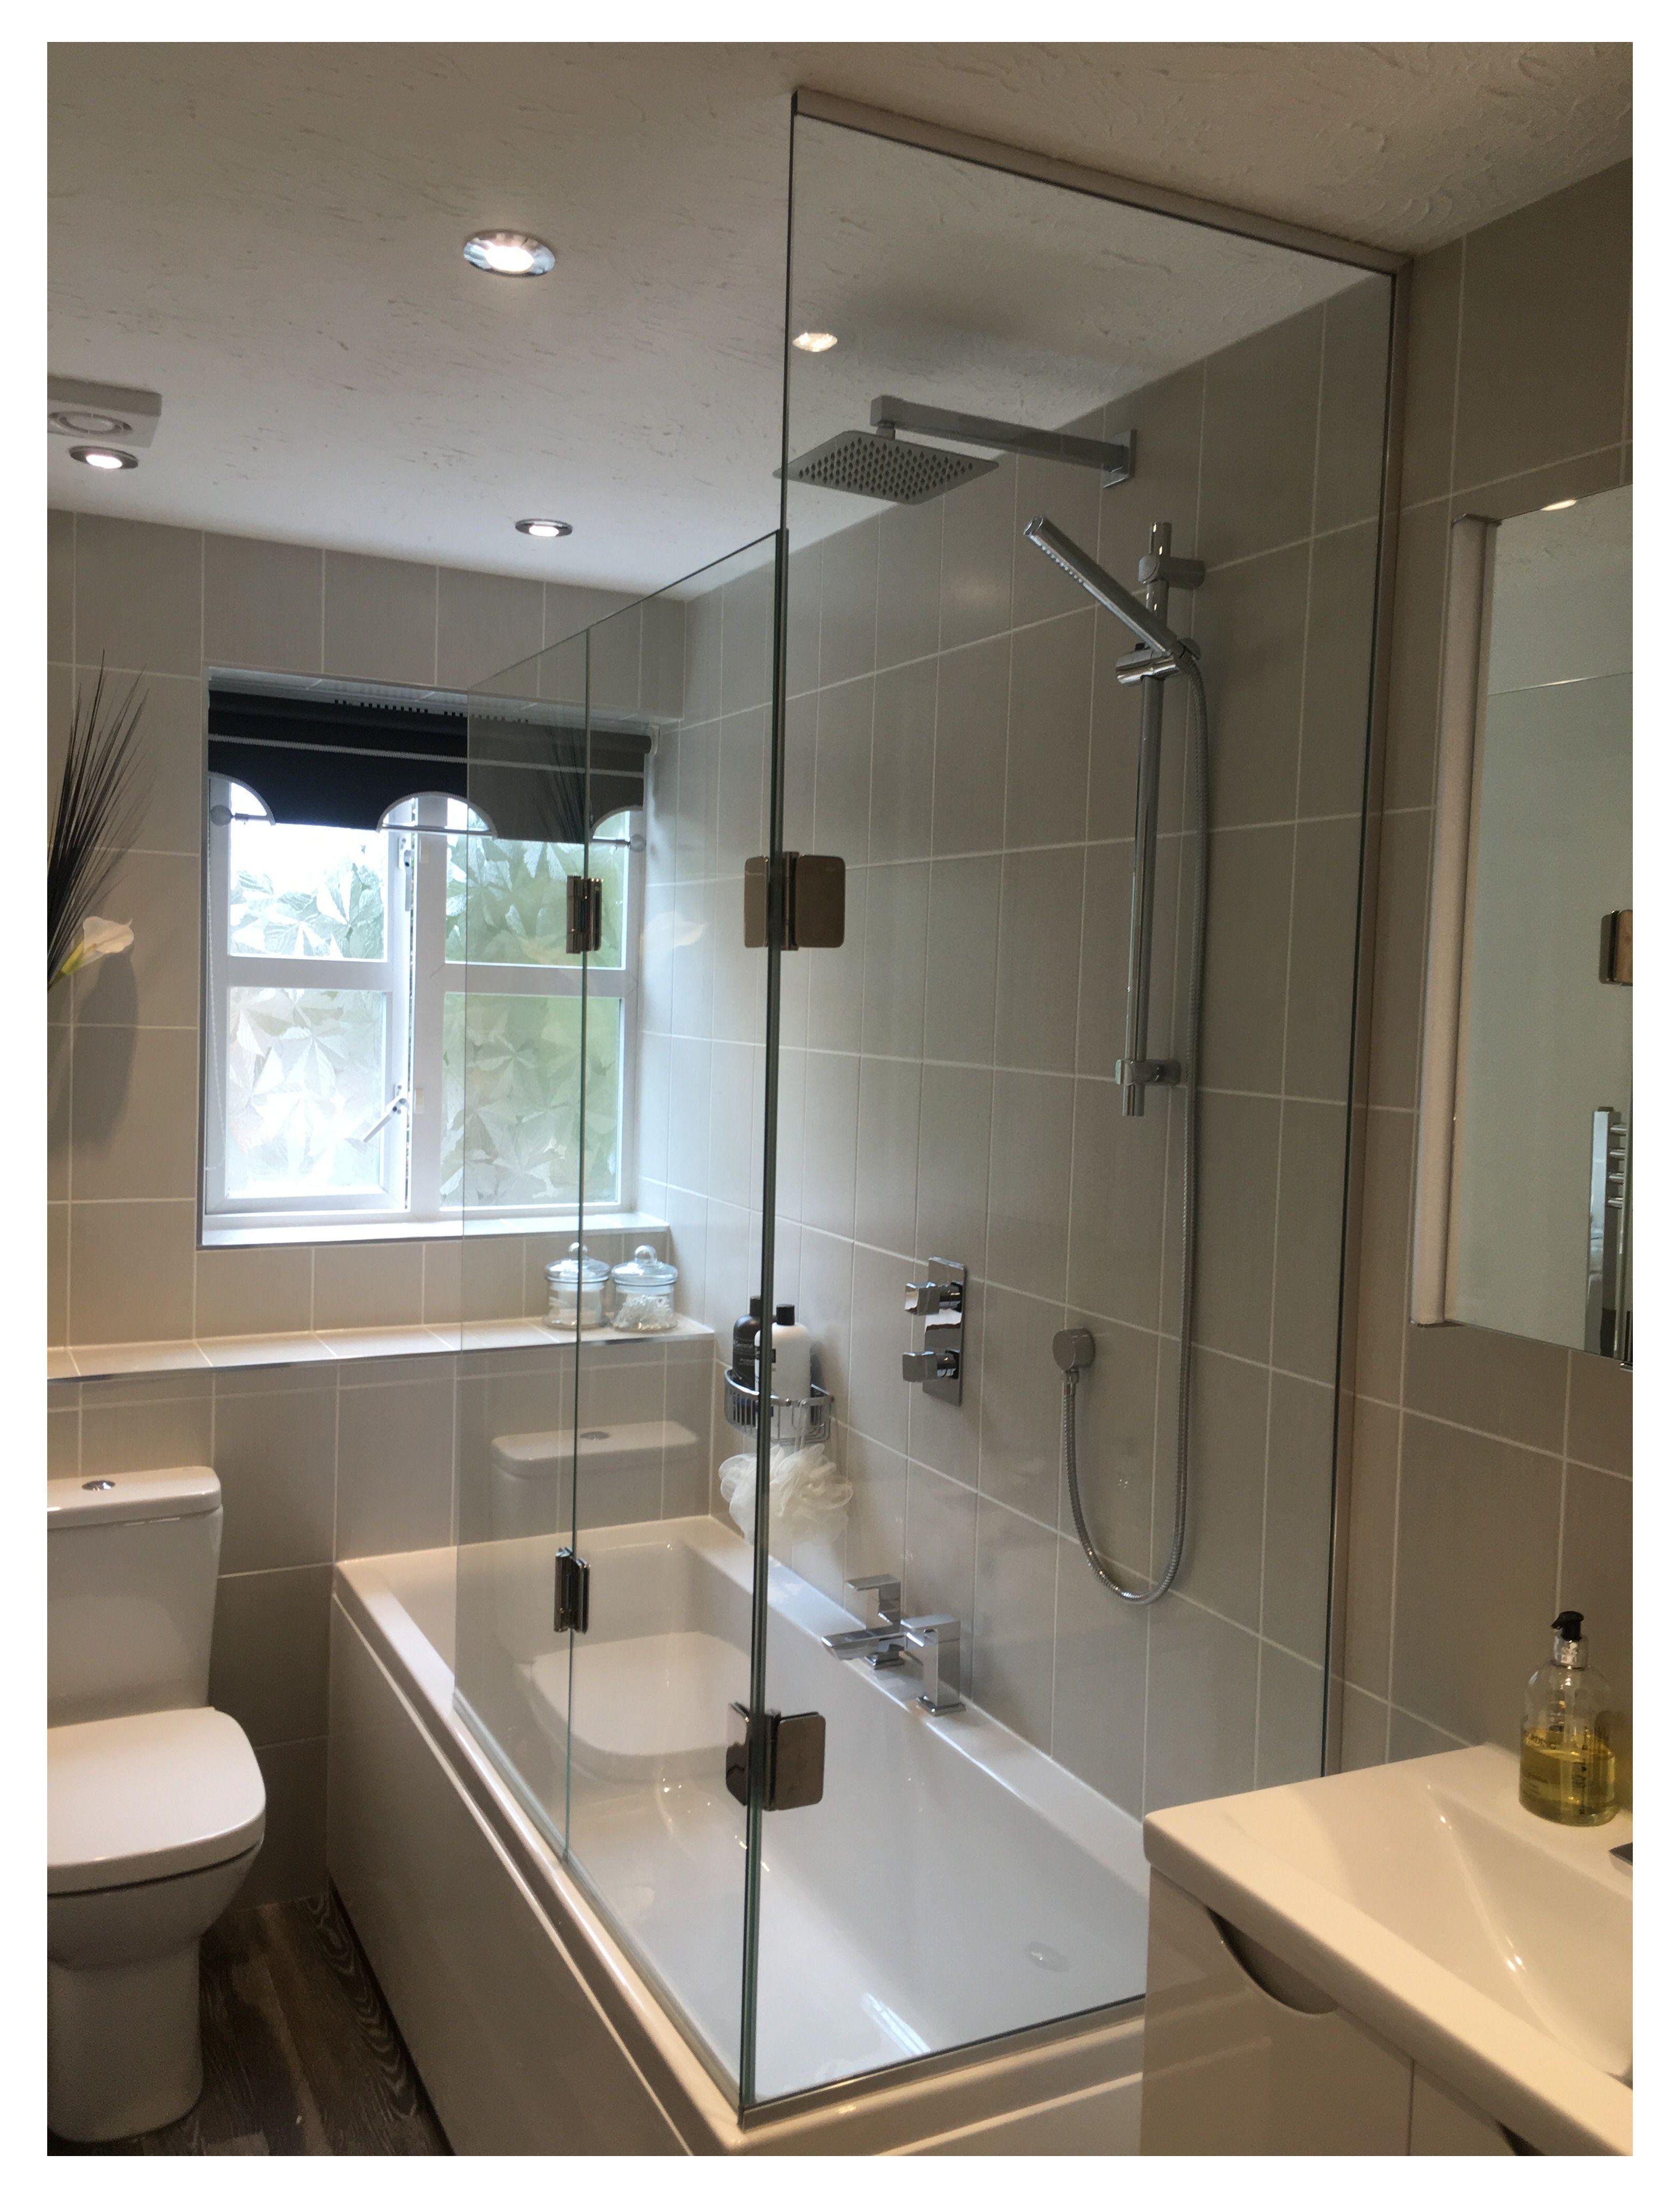 Bespoke Glass Custom Glass Specialists Windsor Glass360 Frameless Bespoke Glass Slough In 2020 Bathroom Remodel Shower Bath Shower Screens Bathroom Design Small